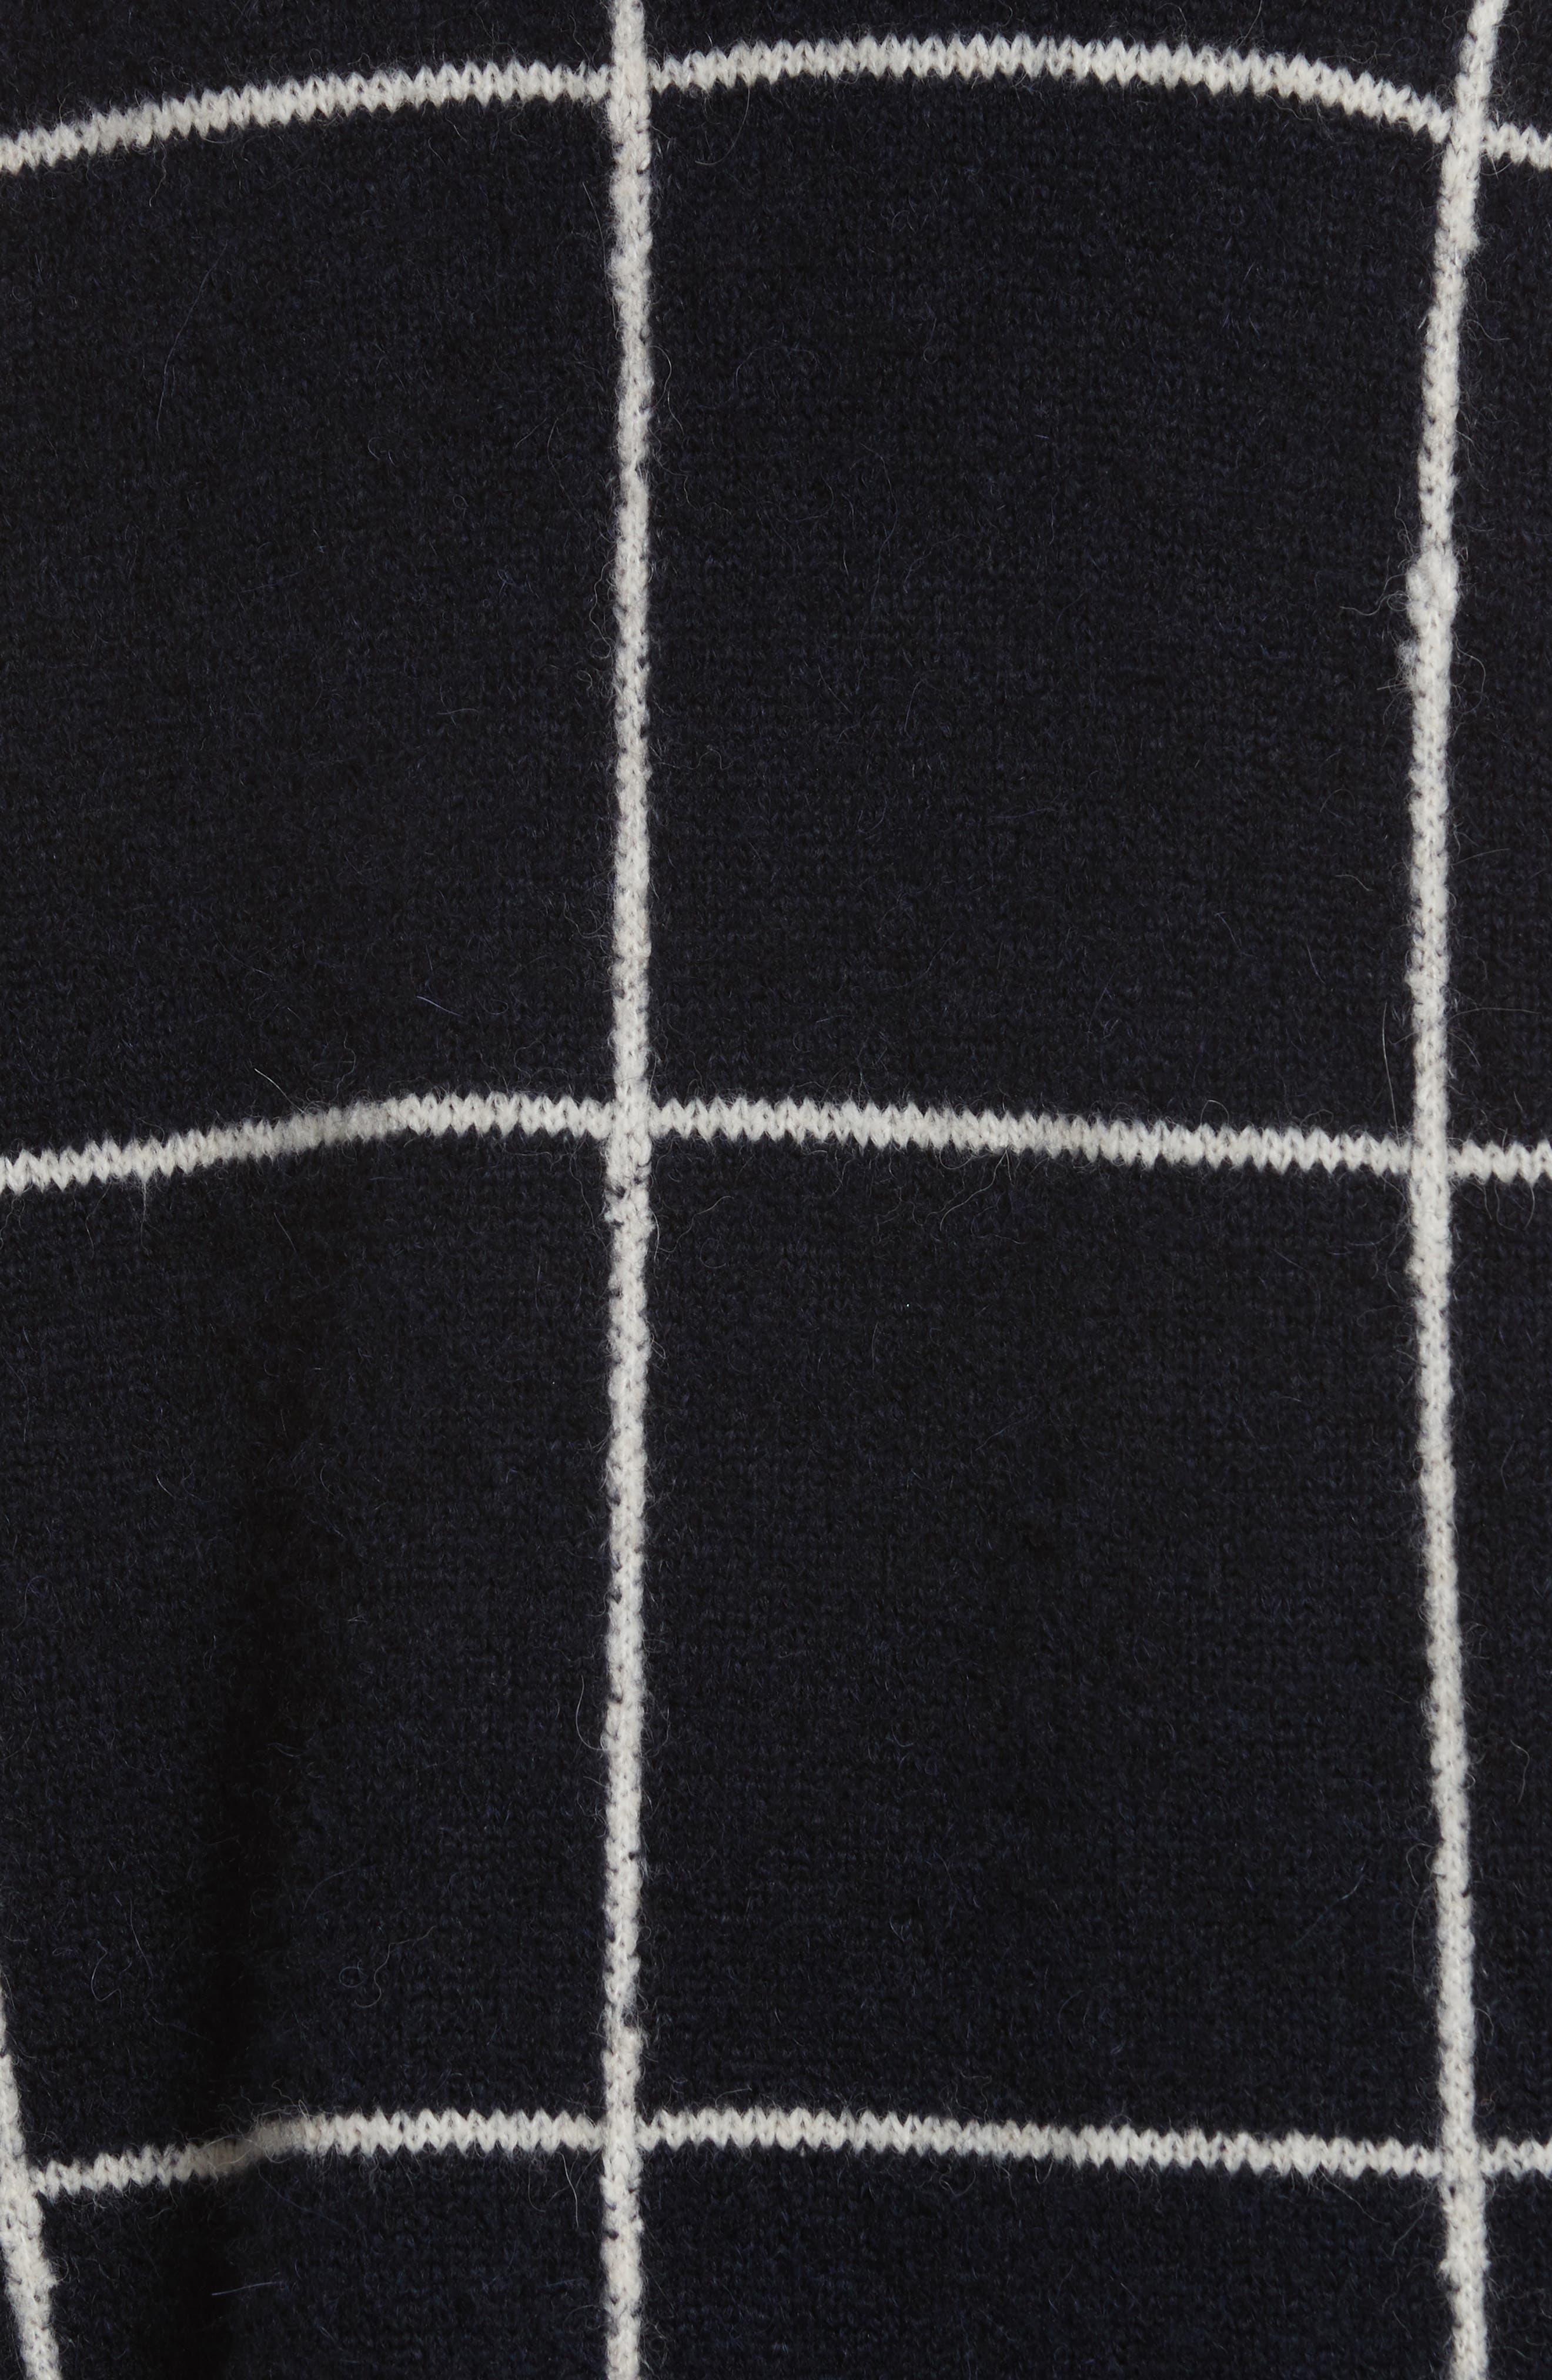 Fionn Windowpane Oversized Sweater,                             Alternate thumbnail 5, color,                             Navy/ Alabaster/ Pollen